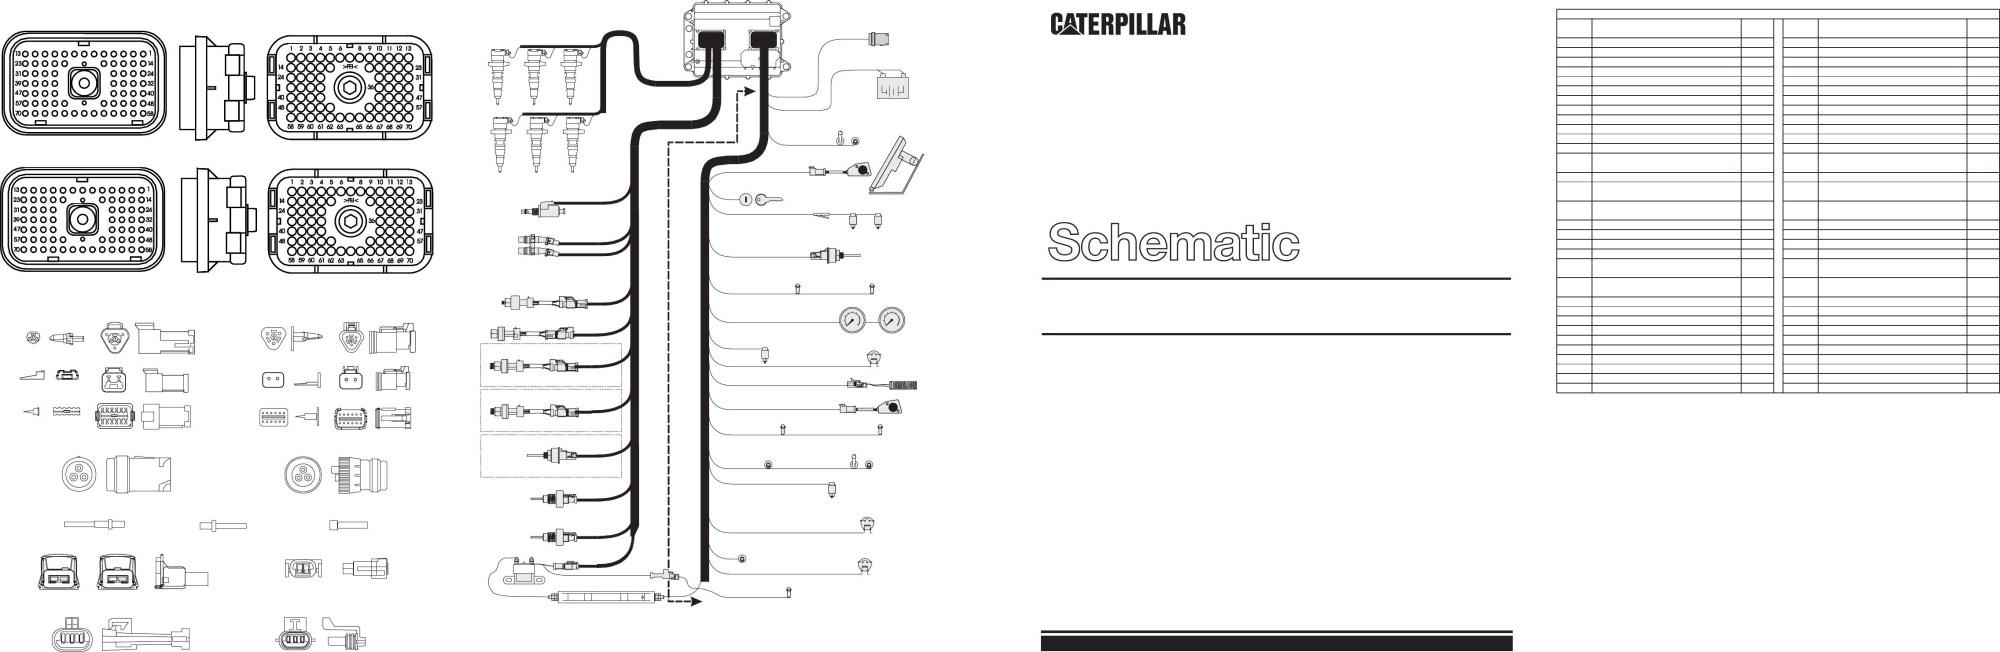 hight resolution of caterpillar c12 engine diagram cat 3126 alternator wiring diagram schematics wiring diagrams of caterpillar c12